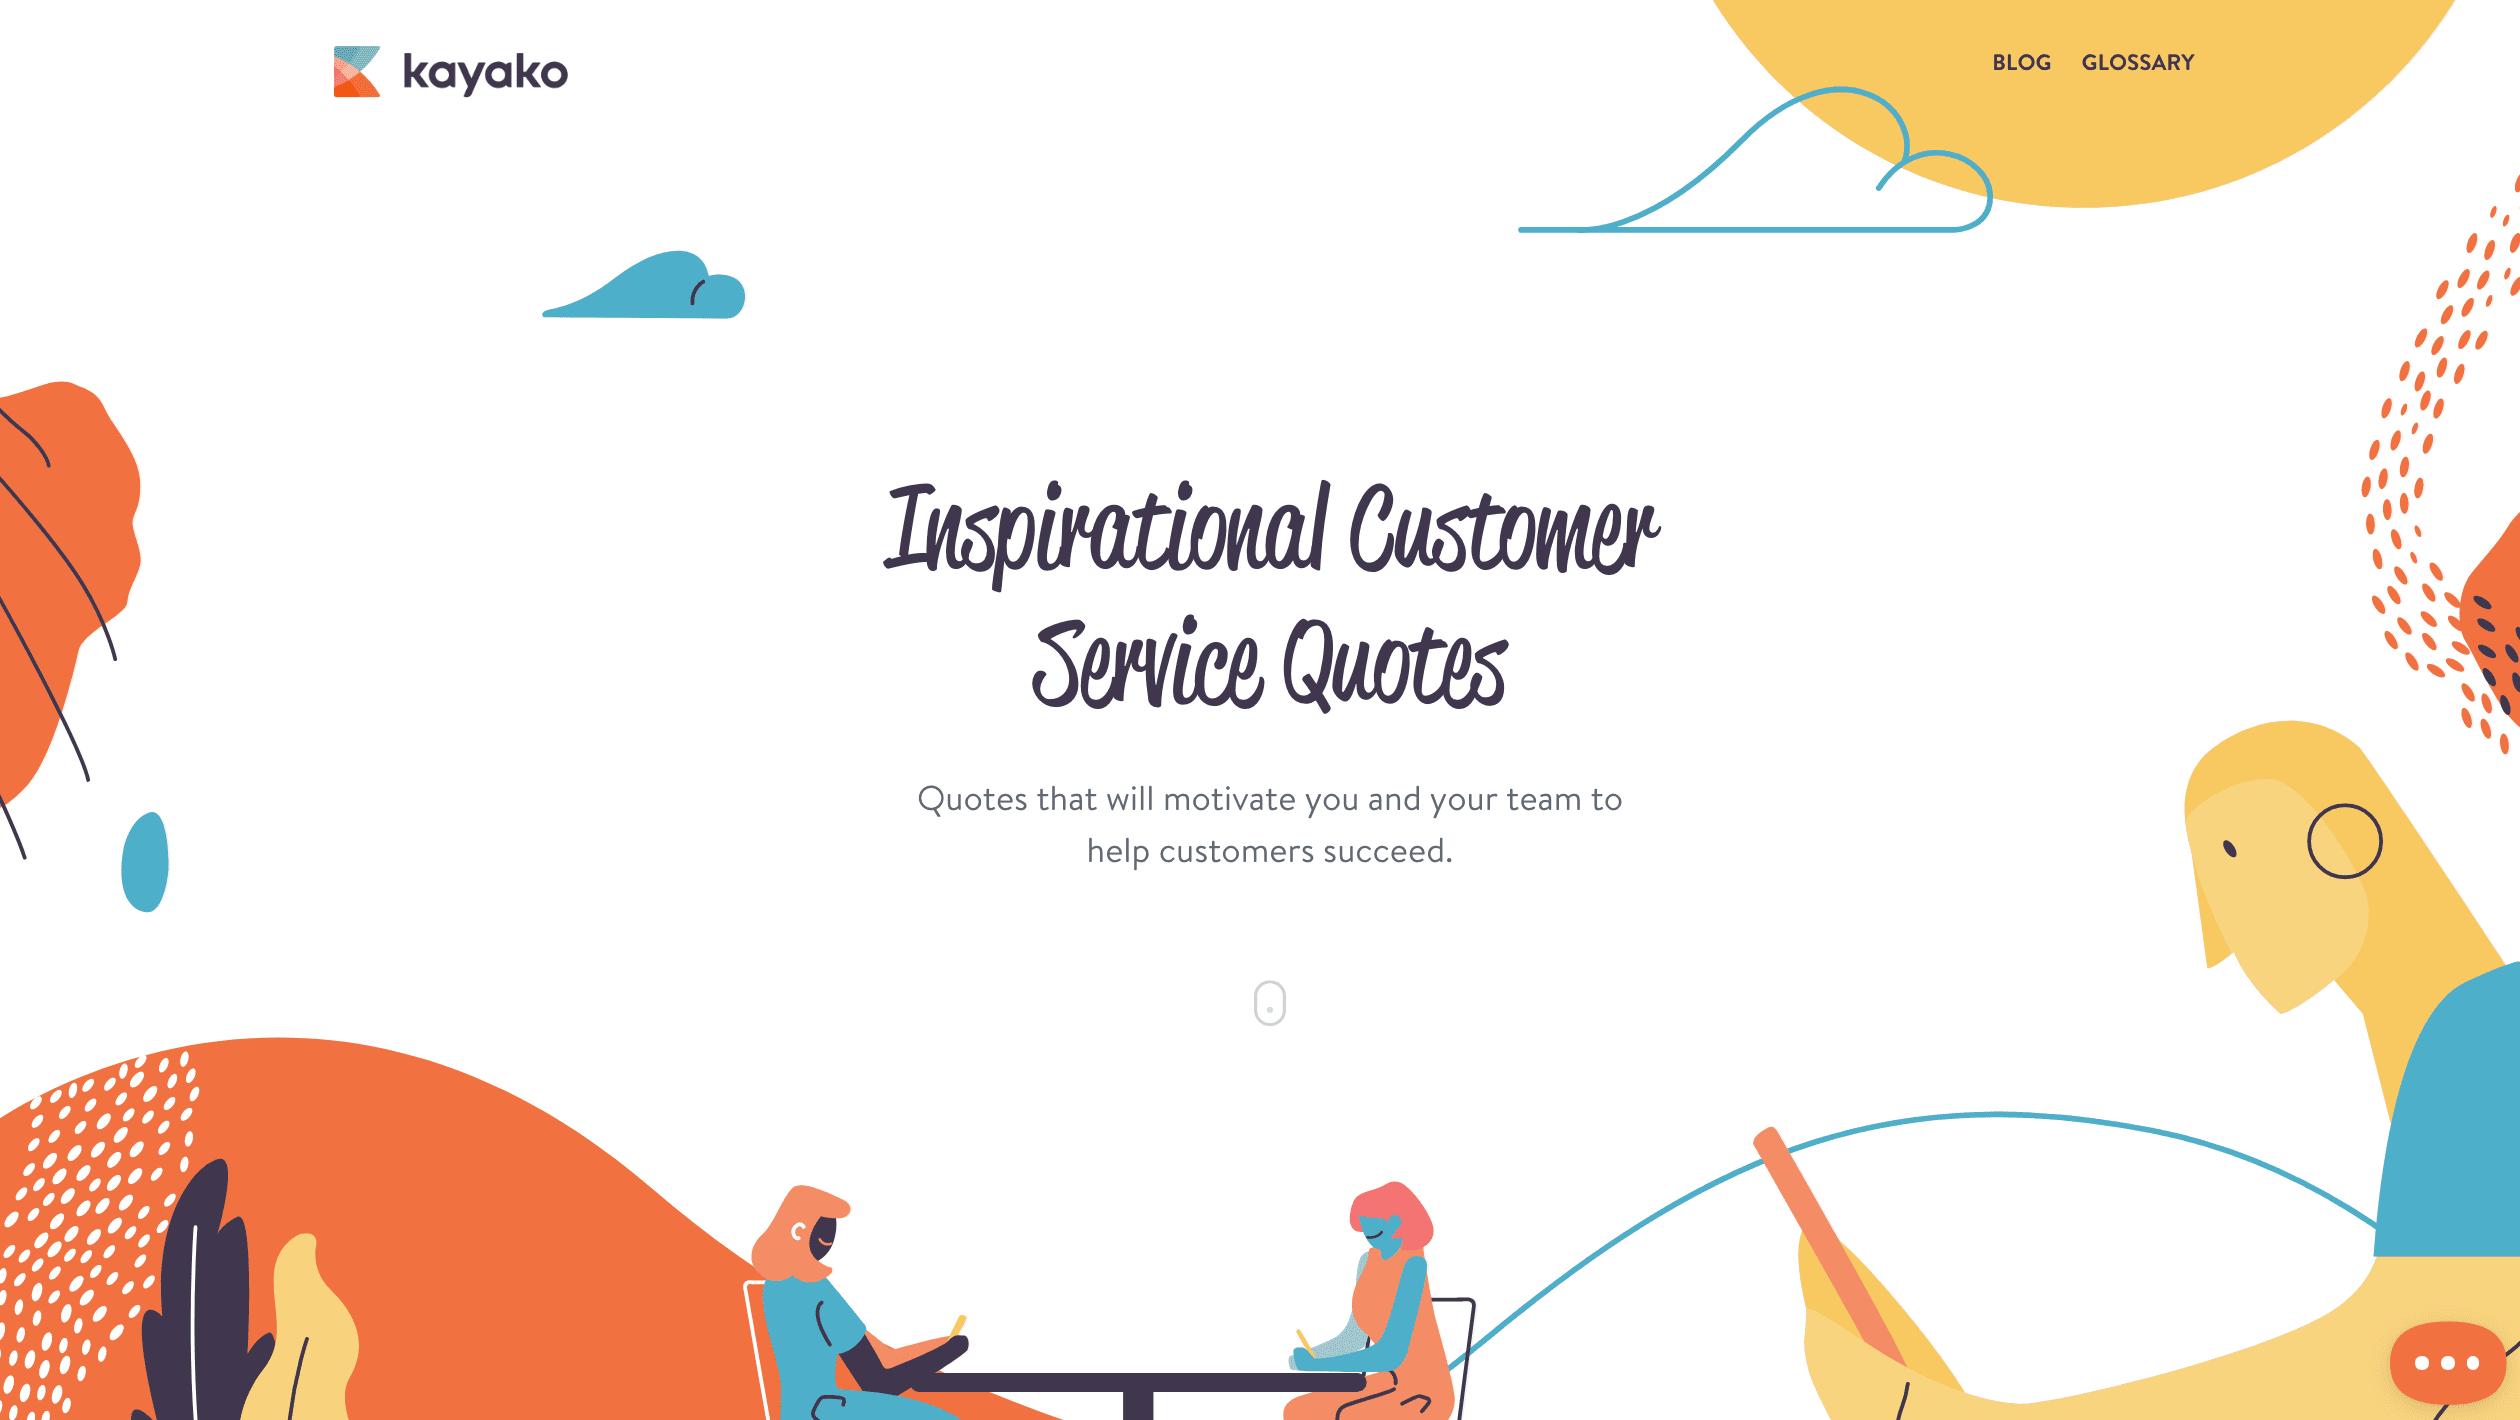 Kayako Customer Service Quotes